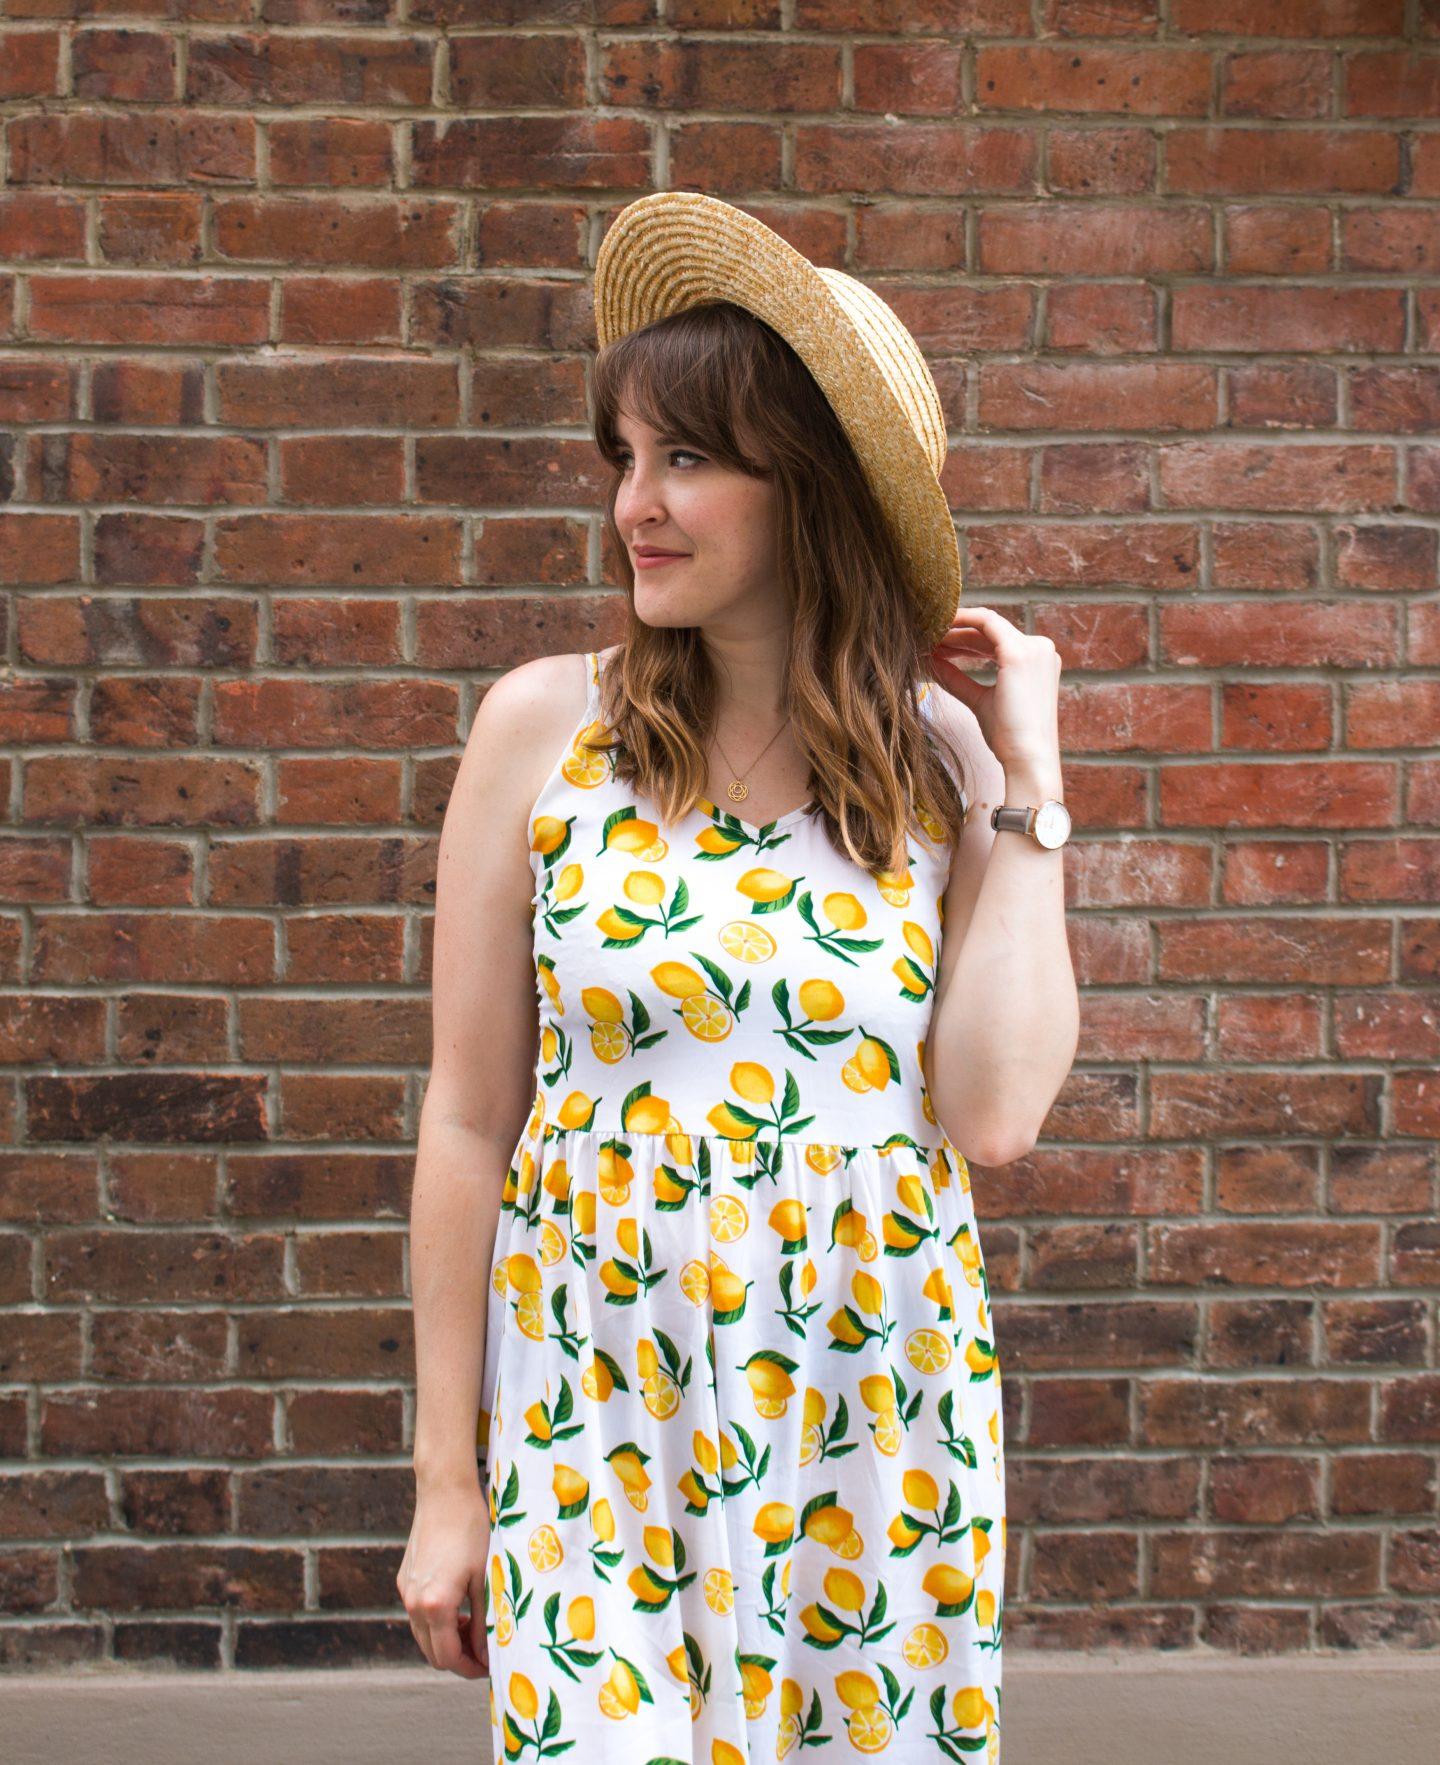 ASOS Vero Moda lemon print dress and ASOS straw hat